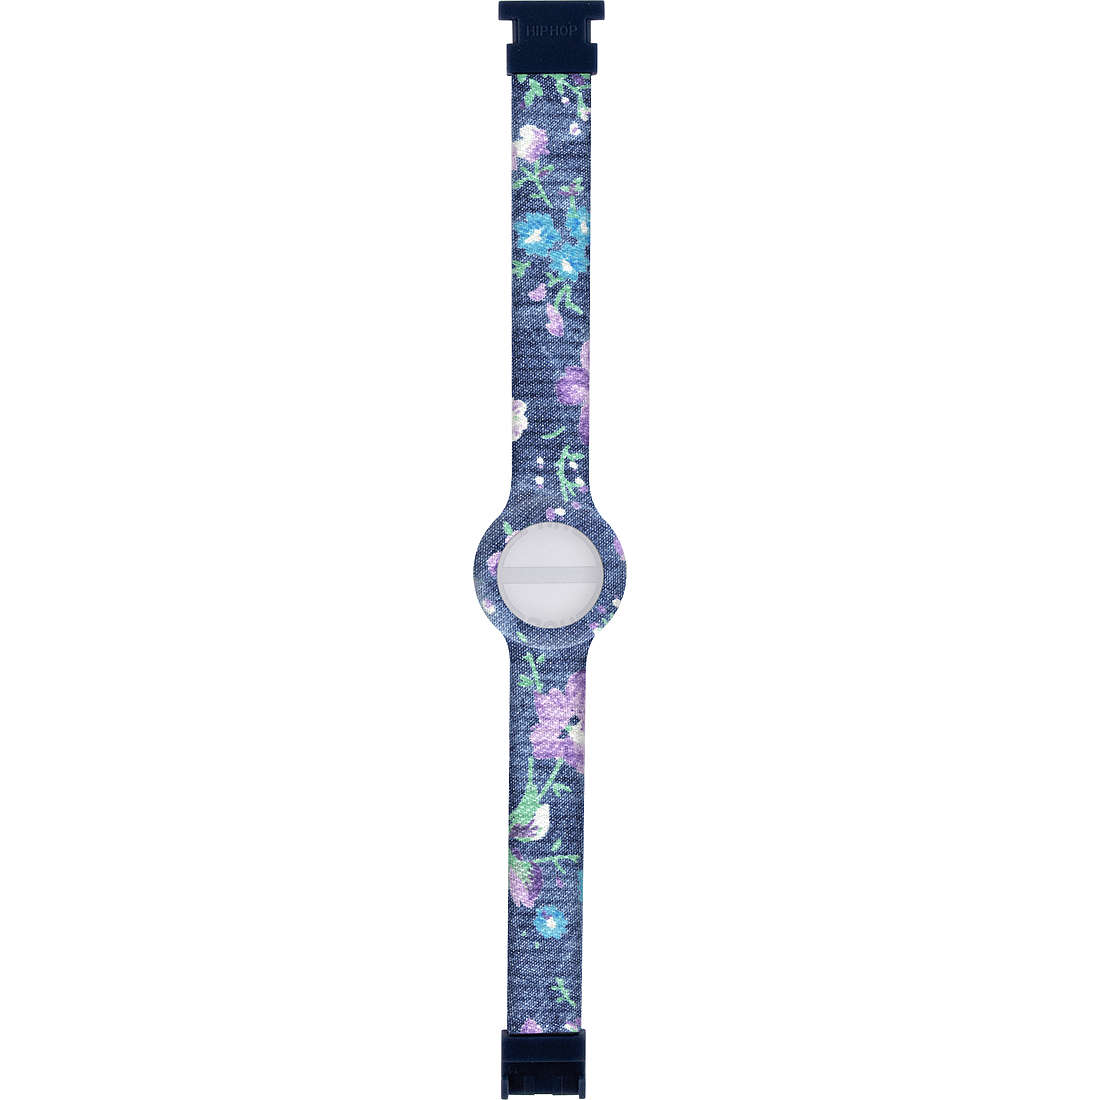 enorme sconto bd407 427c5 orologio cinturino orologio donna Hip Hop Jeans HBU0406 cinturini ...